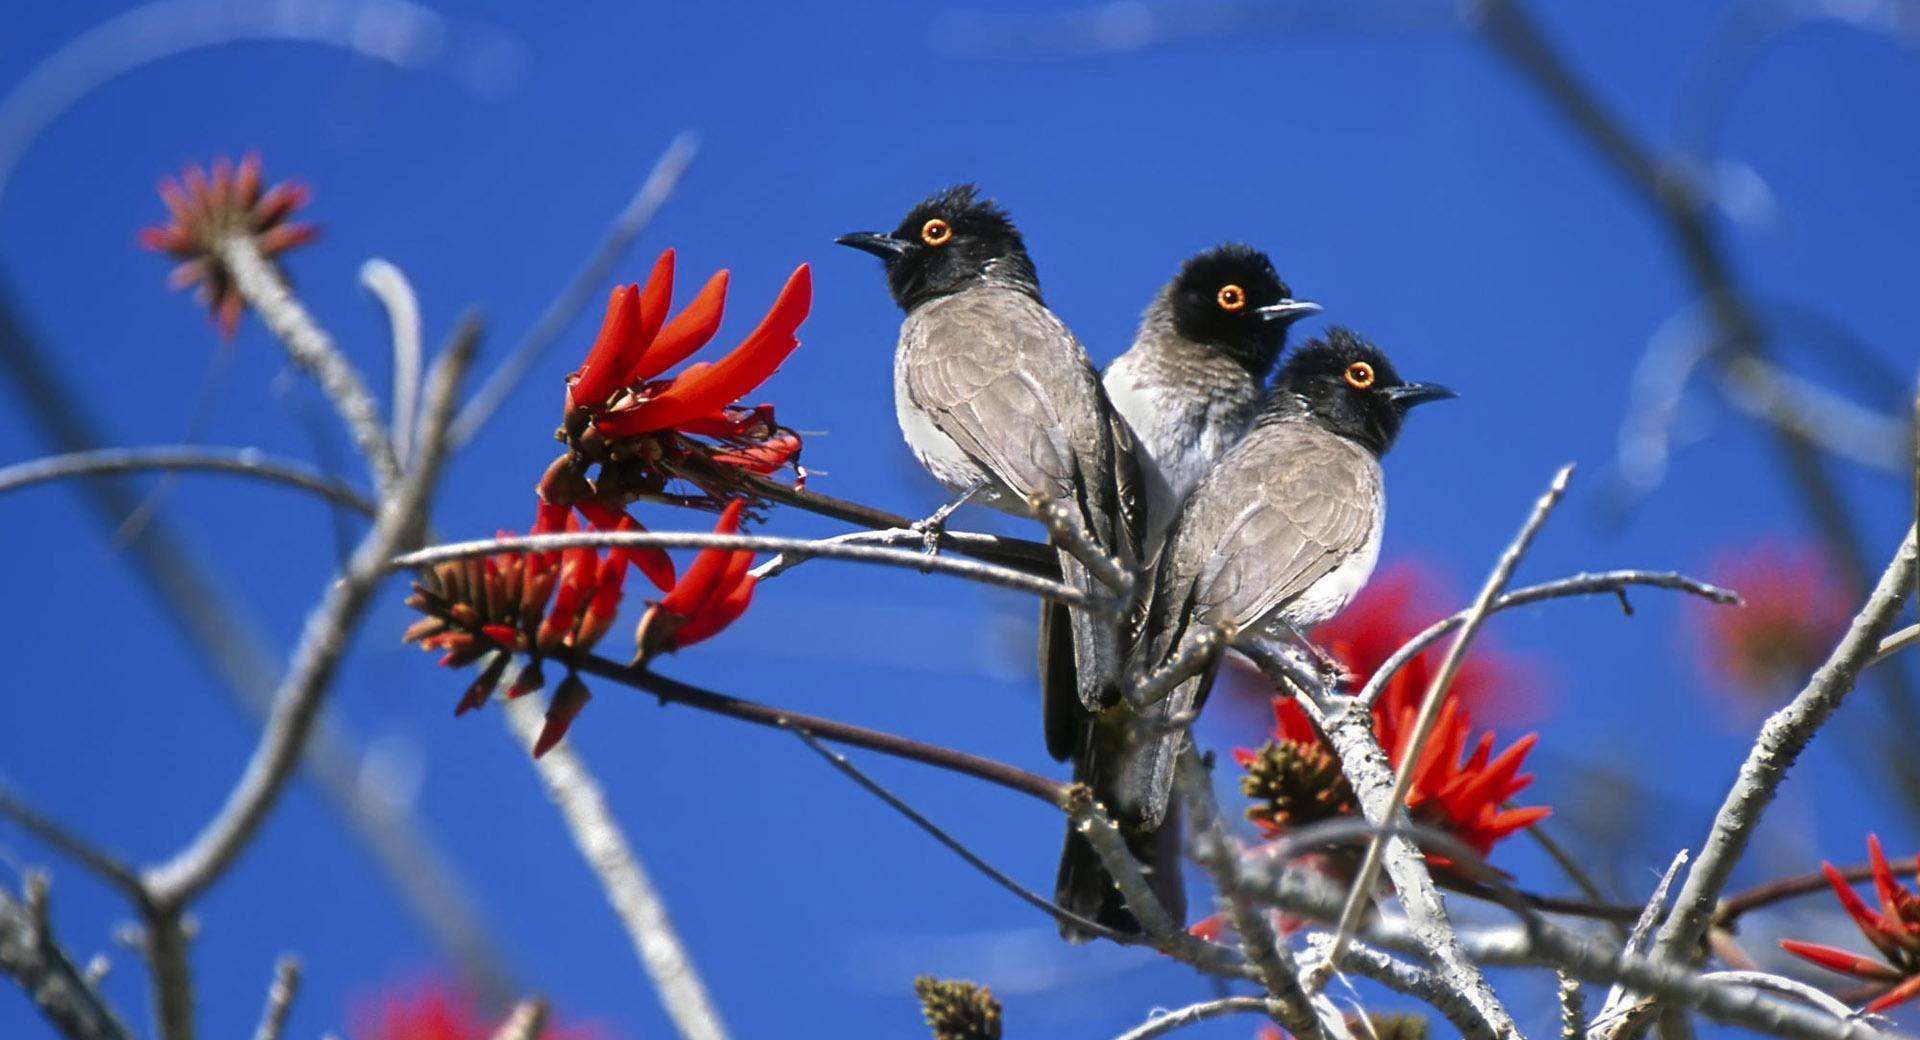 Three Birds Etosha National Park Namibia wallpapers HD quality